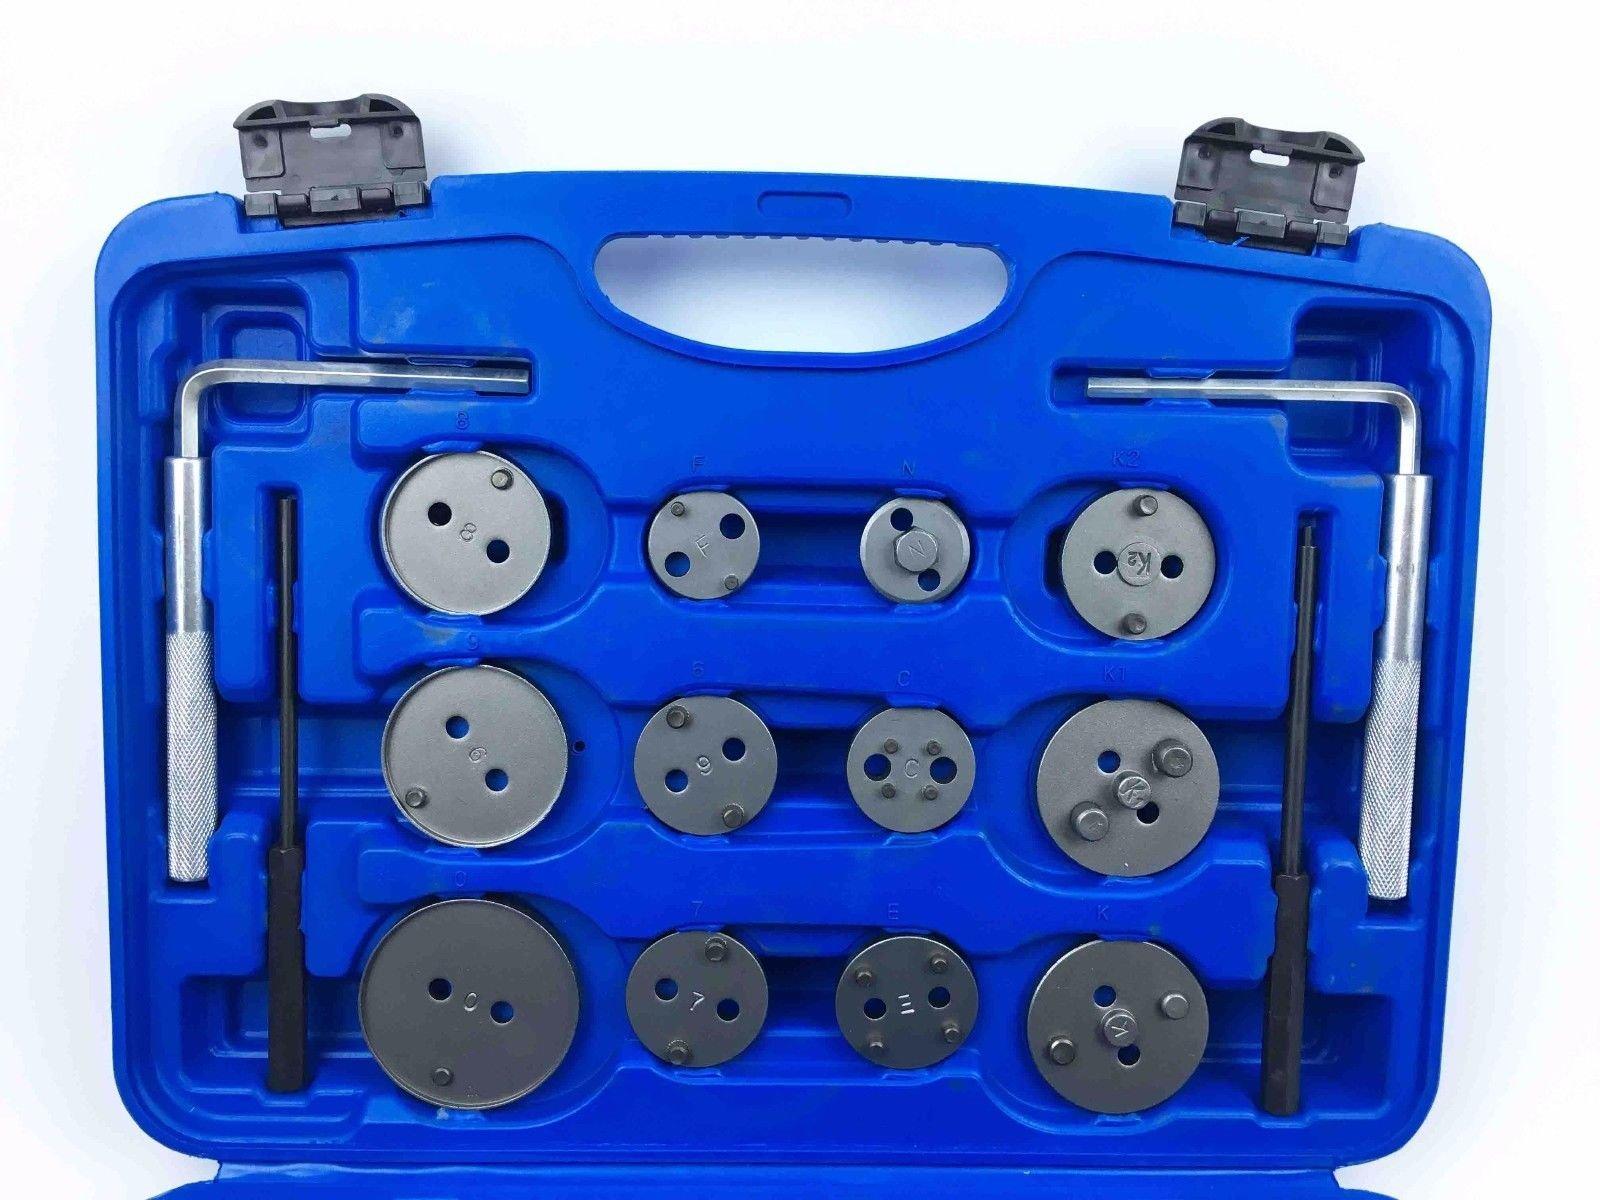 Brake Disc Caliper Wind Back Tool Kit - 35 Piece Universal Piston Rewind Set - Discs Break Pad Caliper Compressor Service Tools - by Jecr (Image #5)